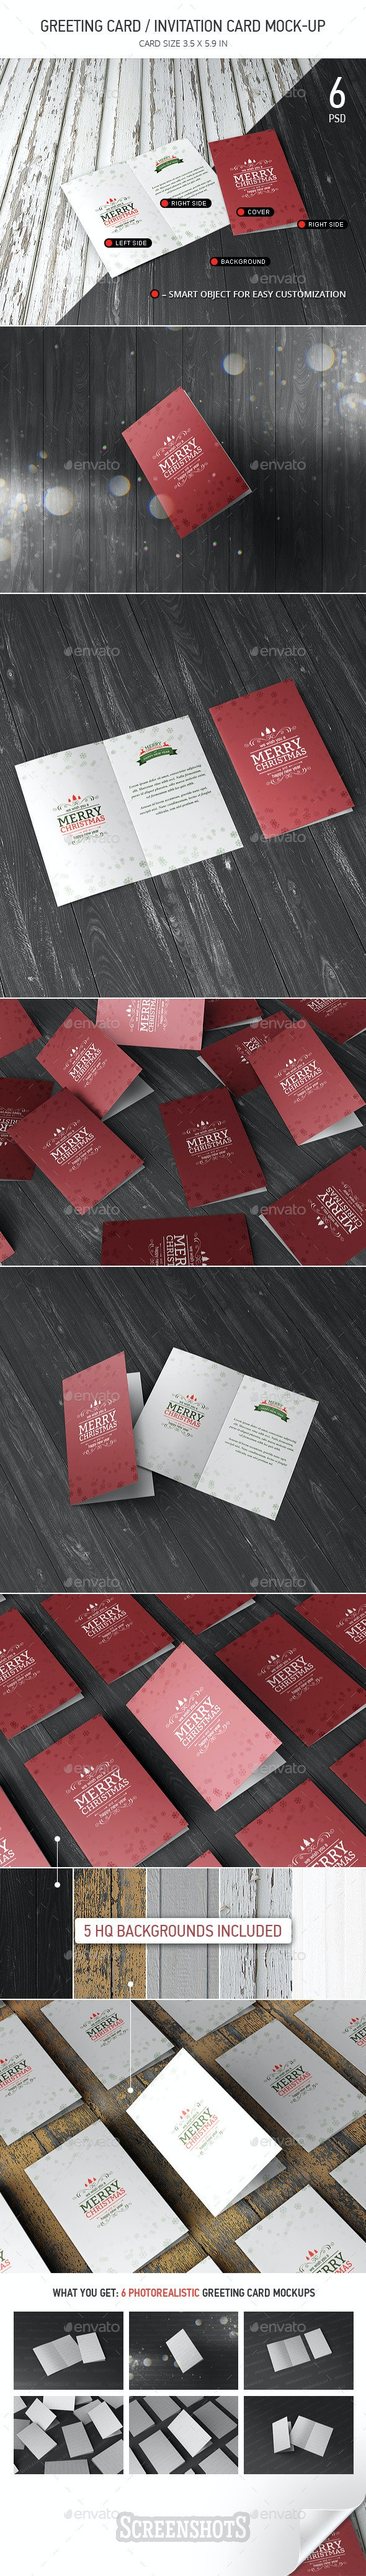 Greeting / Invitation Card Mock-Up  - Miscellaneous Print